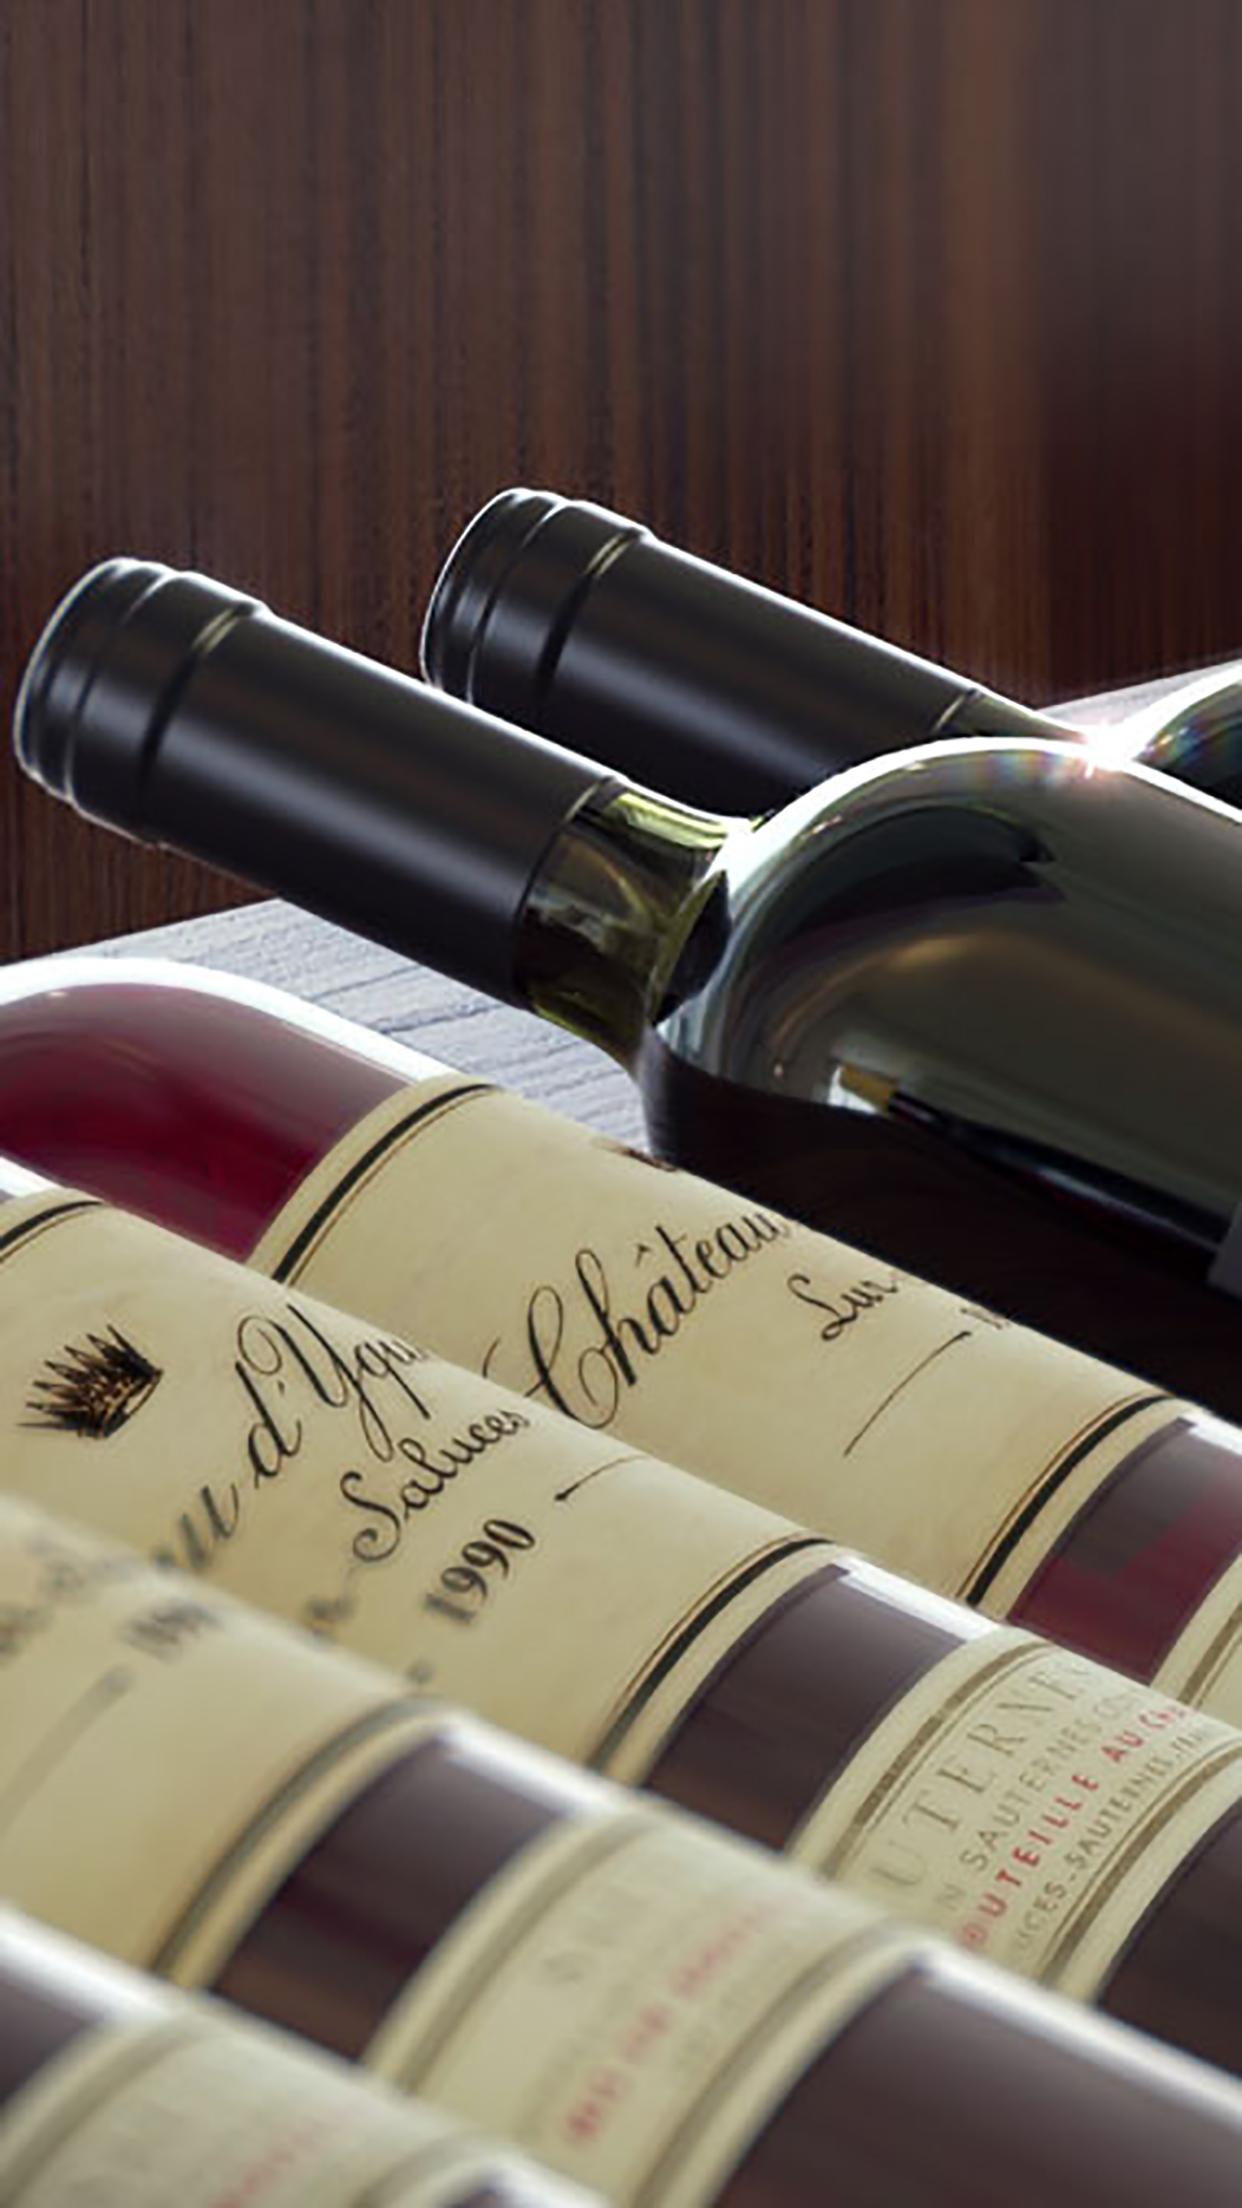 Wine Cellar 1 3Wallpapers iPhone Parallax Wine Cellar : 1